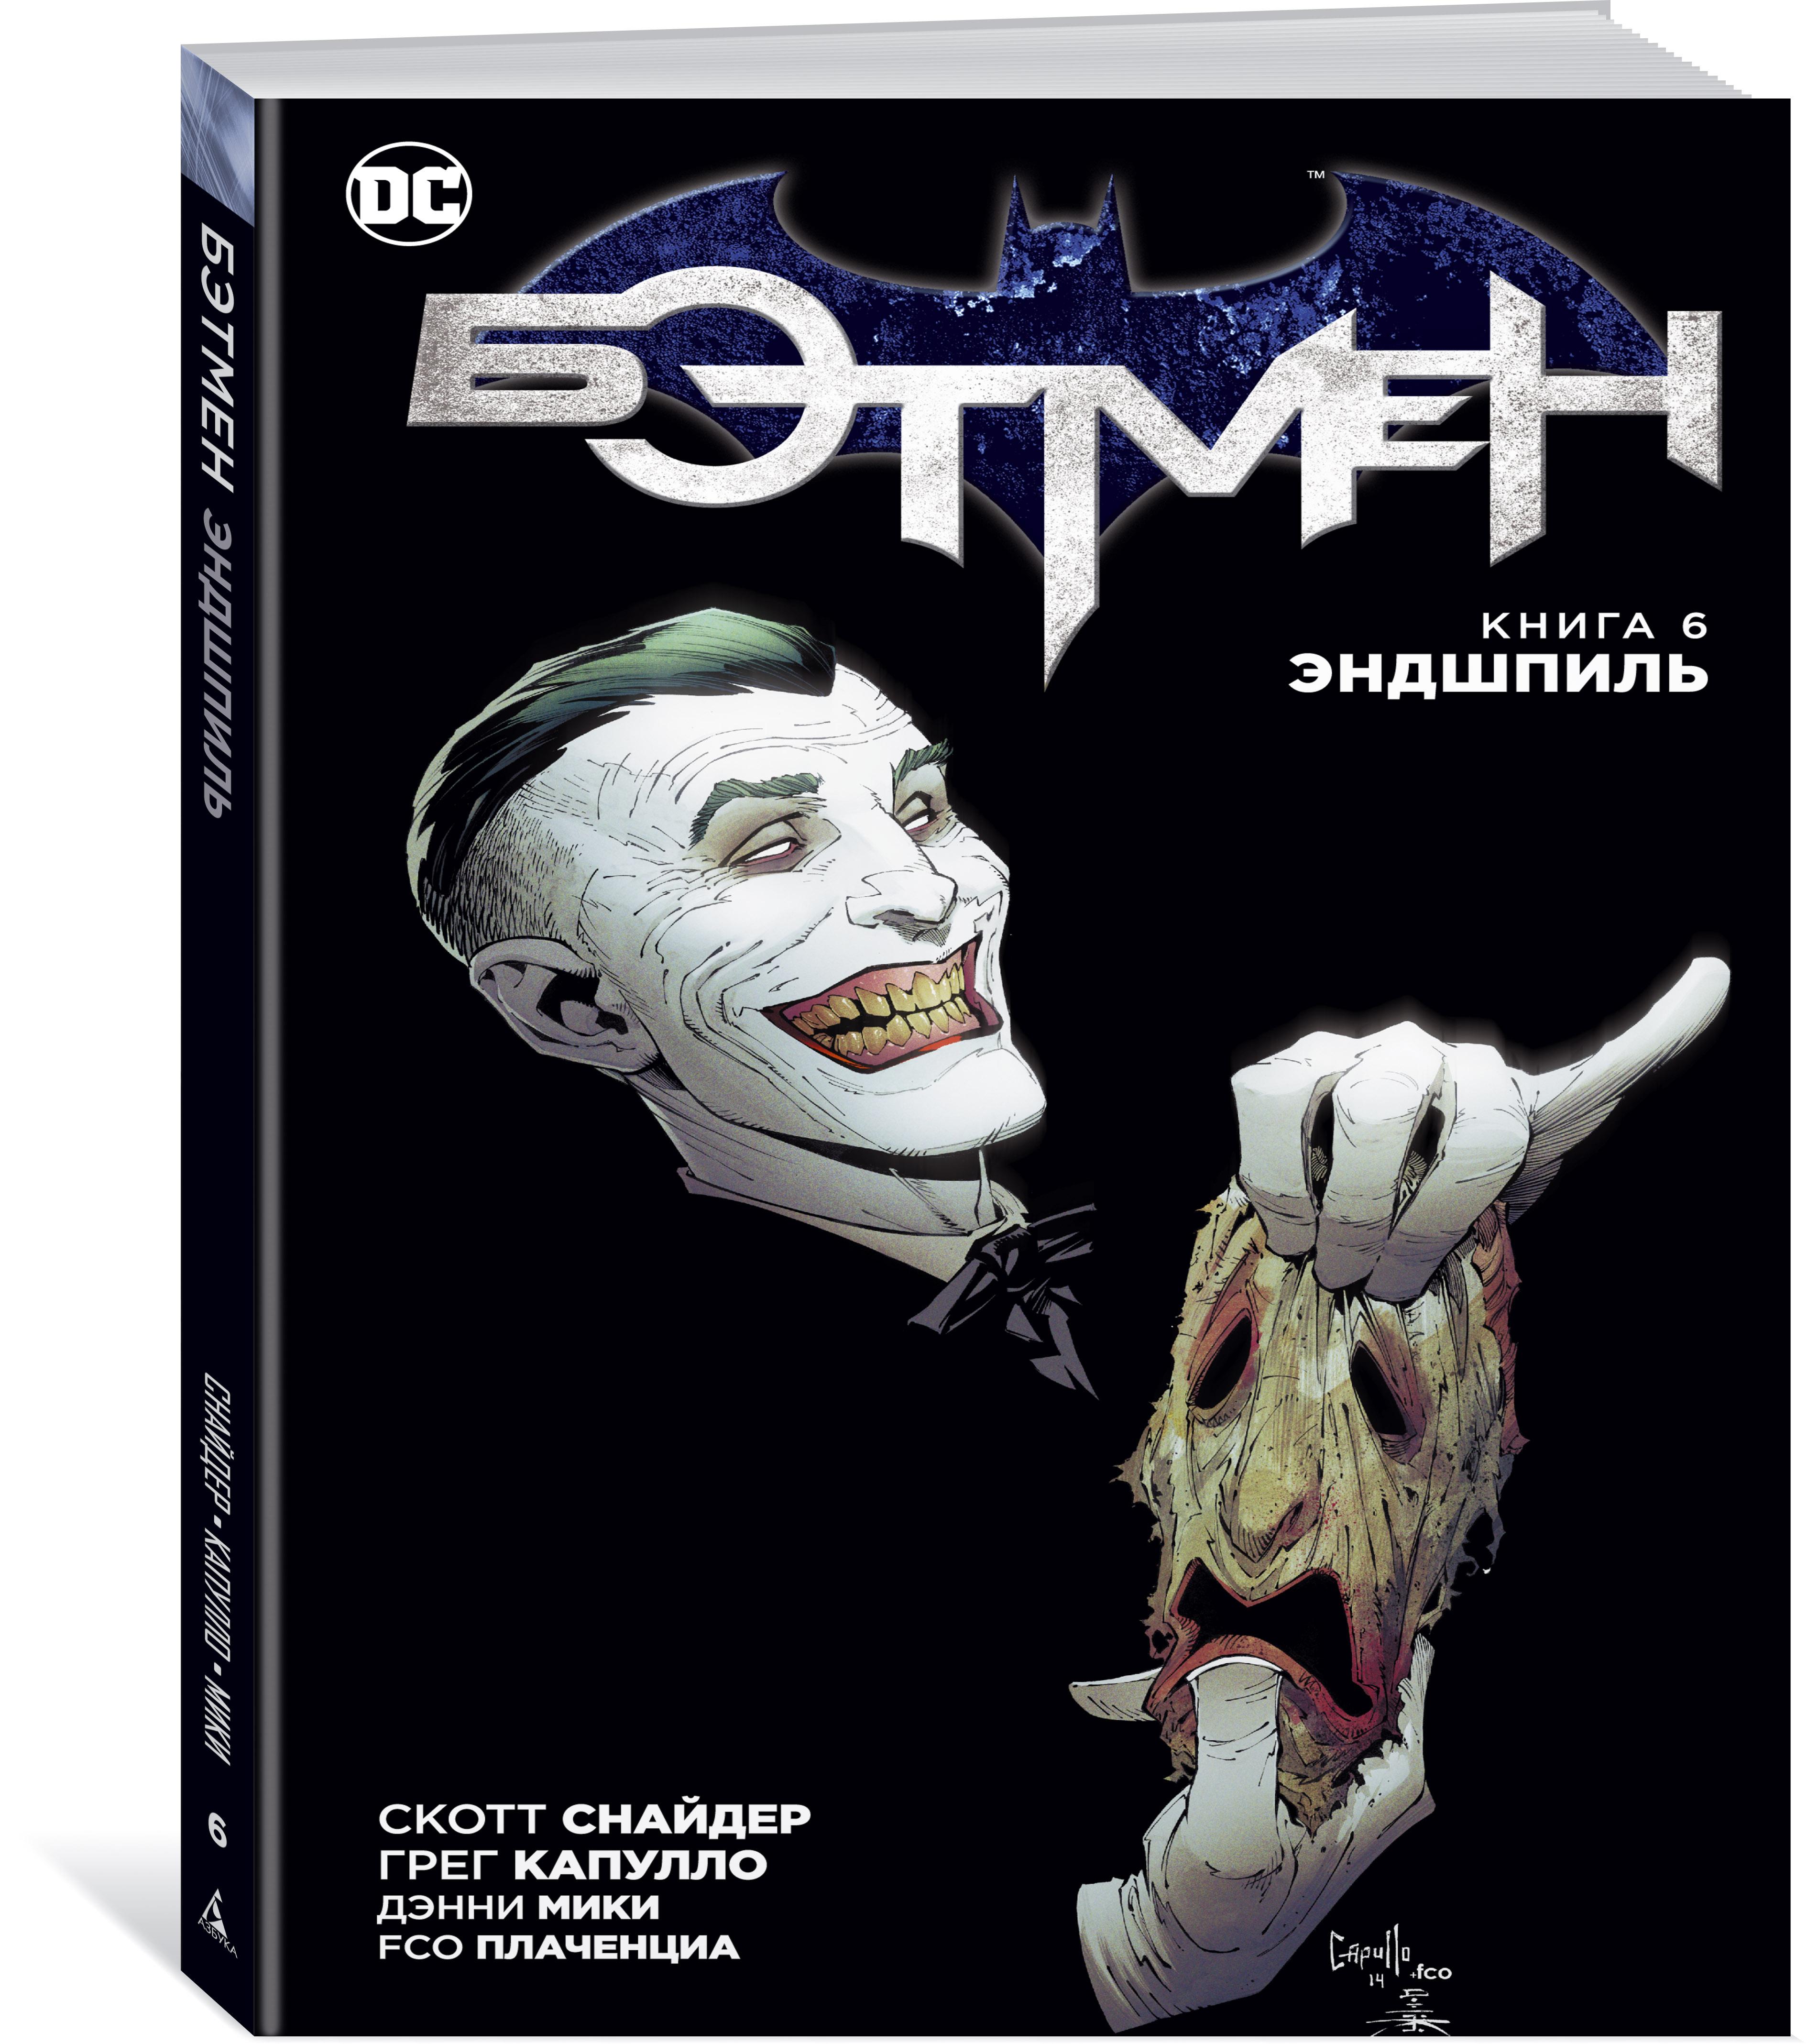 Скотт Снайдер Бэтмен. Книга 6. Эндшпиль